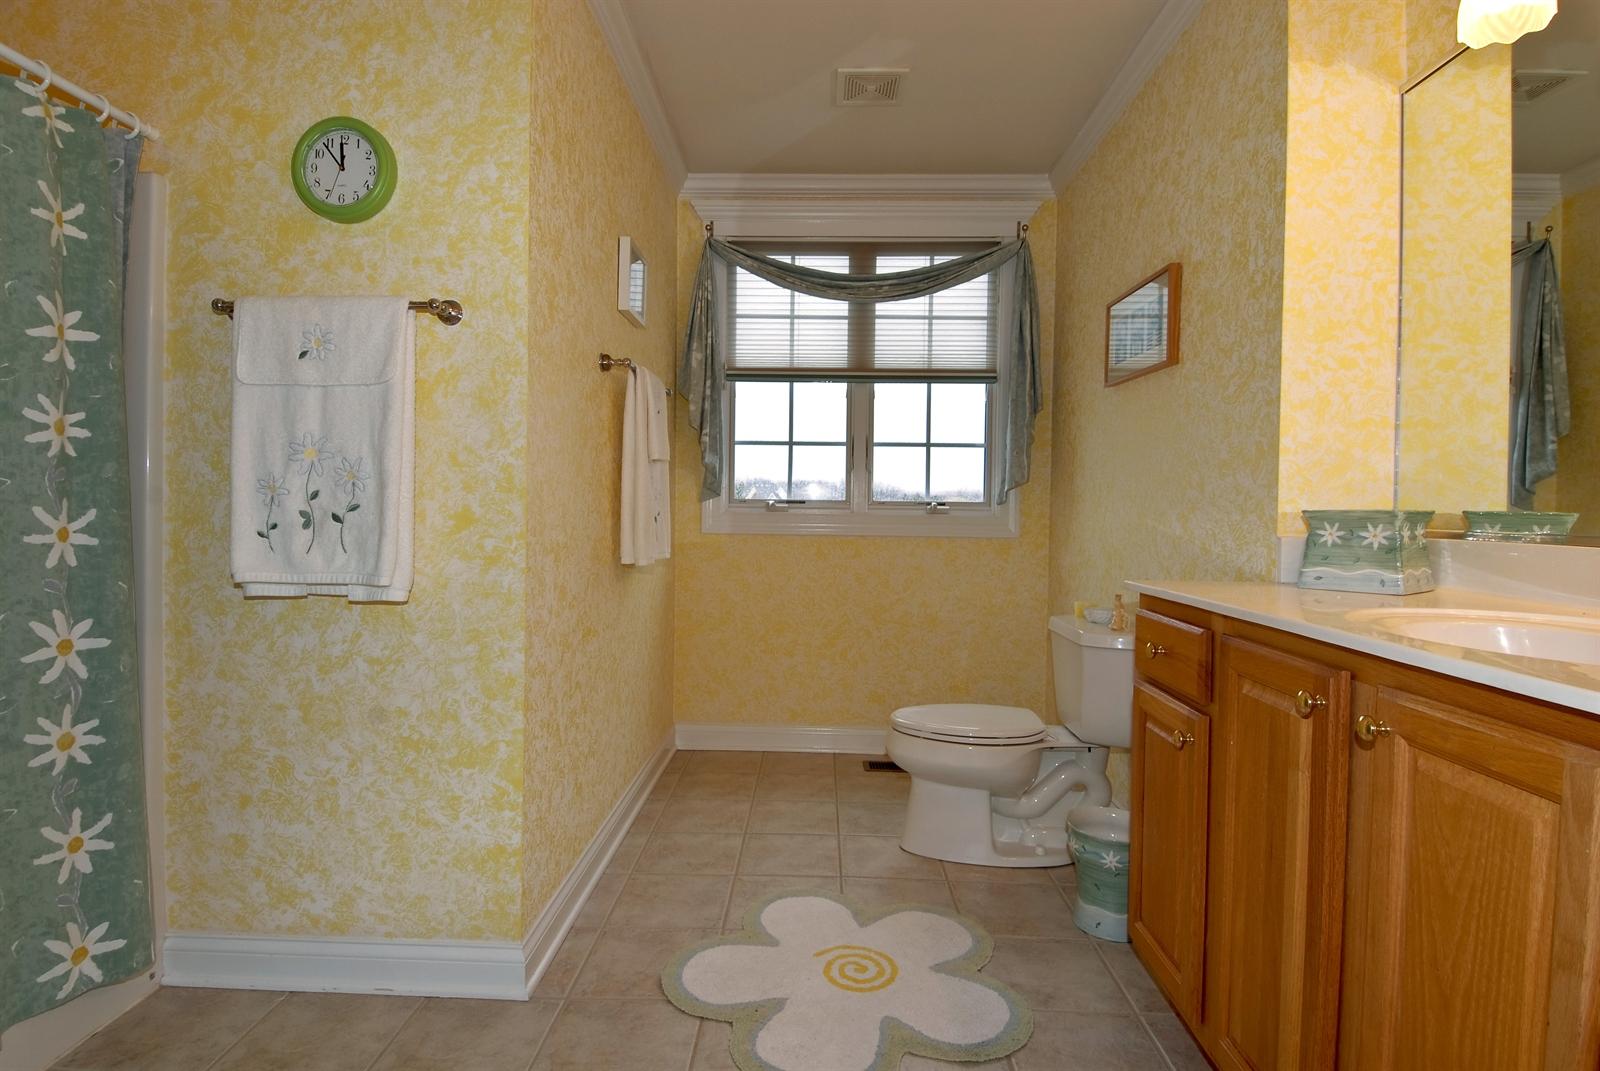 Real Estate Photography - 4N481 Samuel Clemens Dr, Saint Charles, IL, 60175 - Bathroom